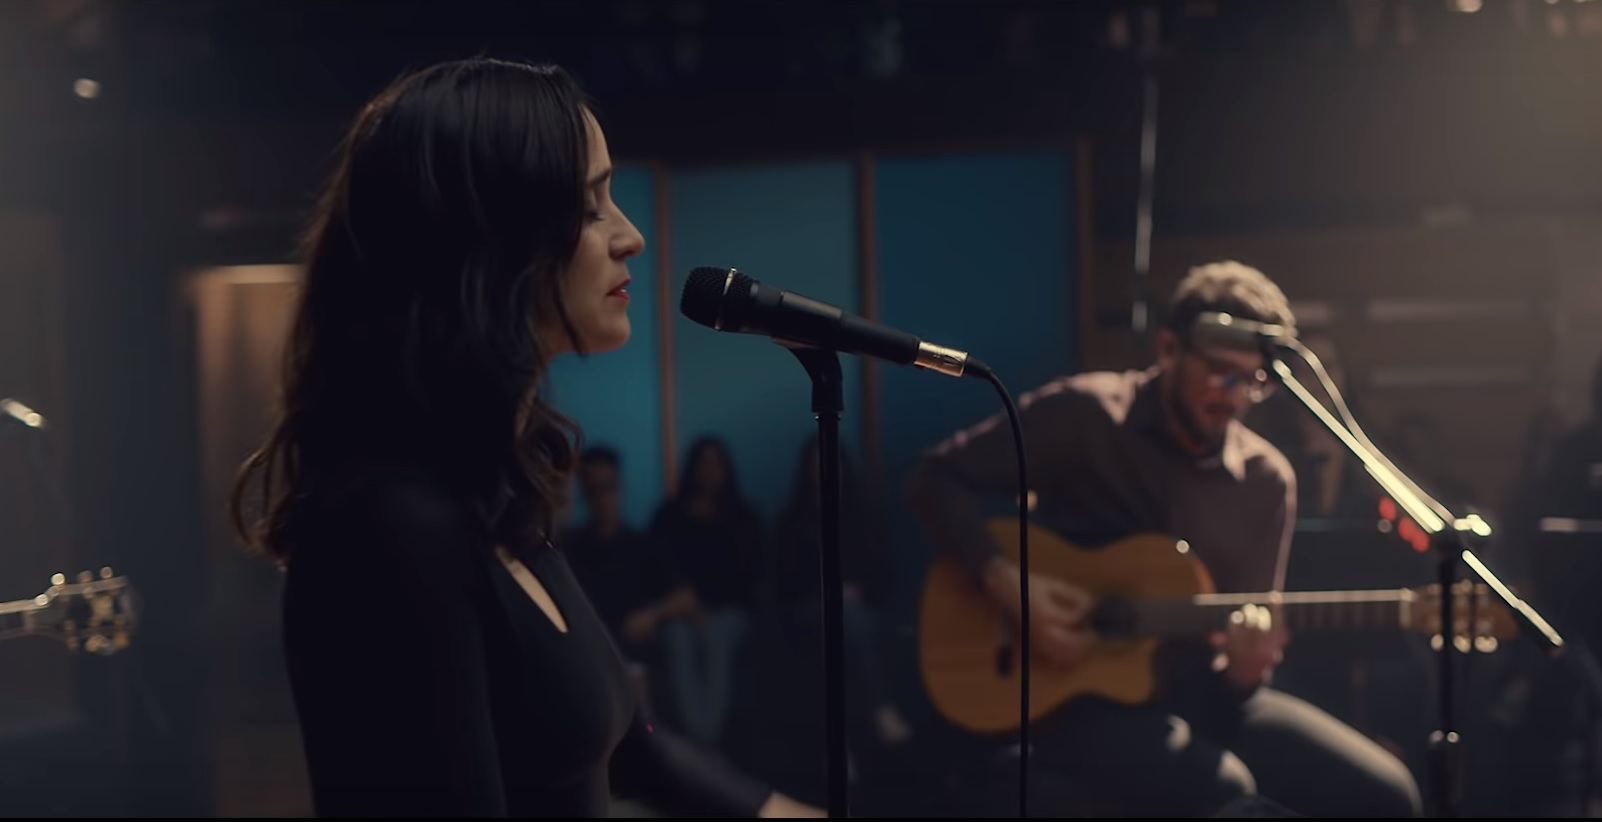 No Te Va Gustar ft. Julieta Venegas - Chau (Video Oficial)